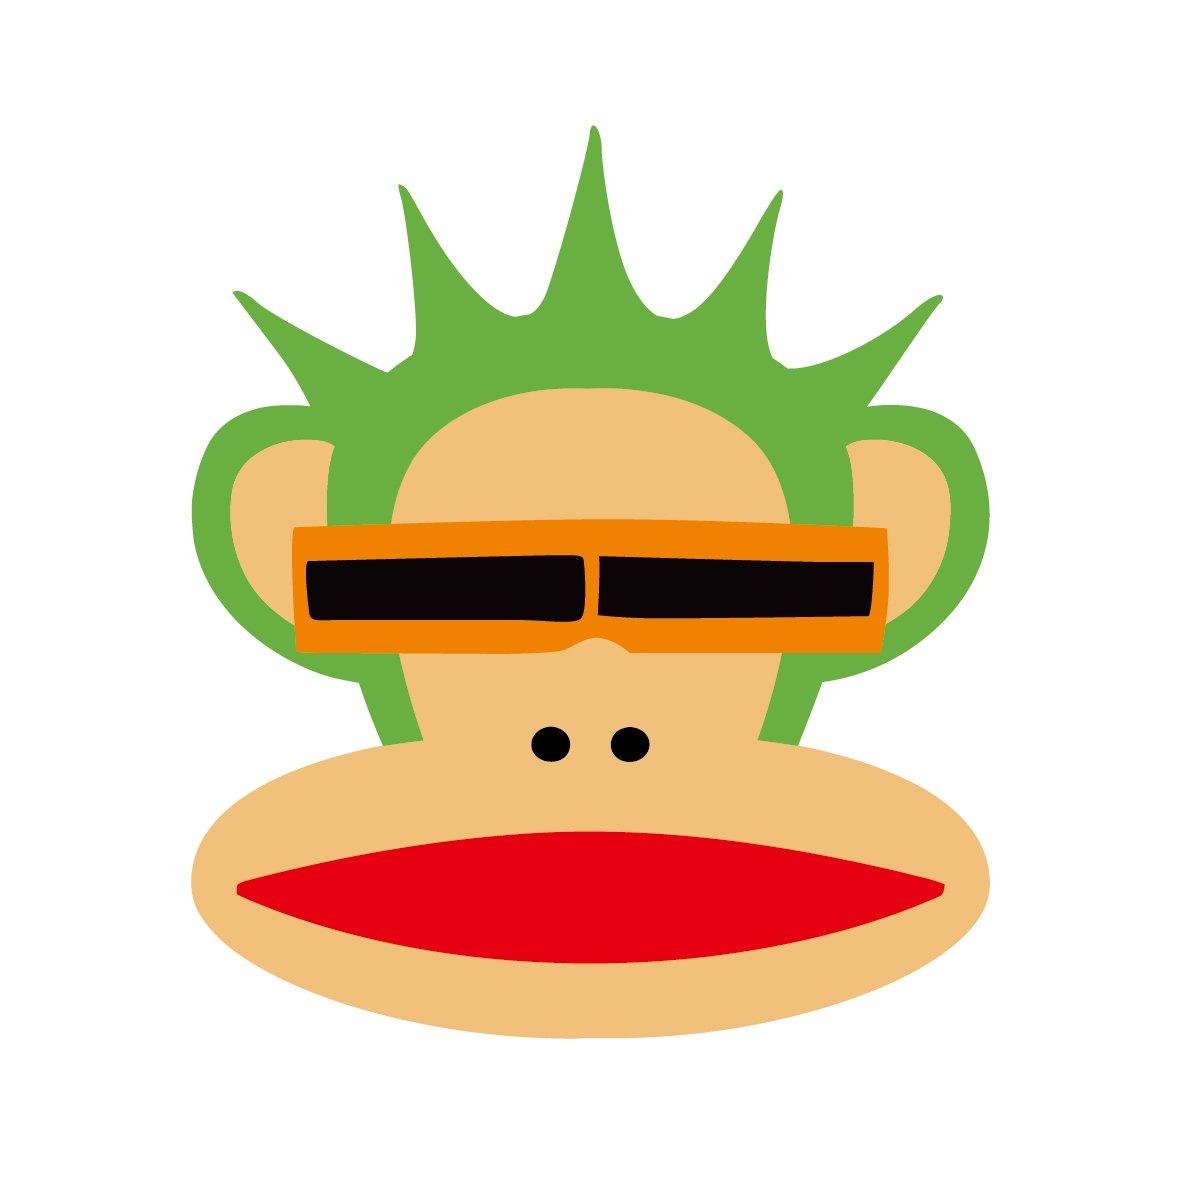 ky 卡艺 汽车贴纸 大嘴猴paulfrank 大嘴猴 头像 表情 搞笑可爱卡通图片